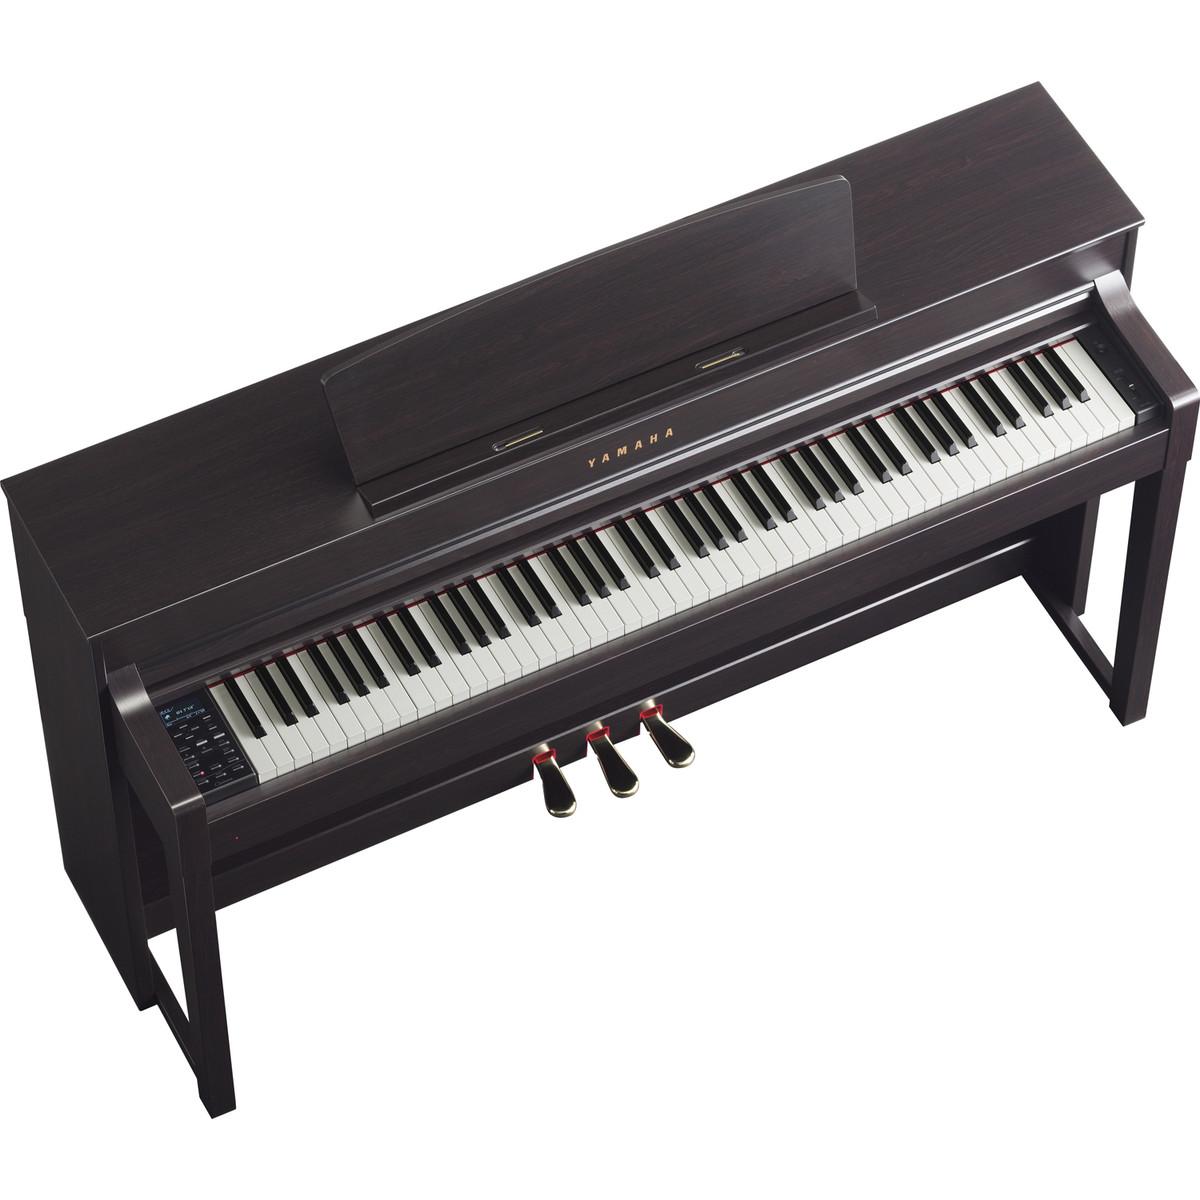 yamaha clavinova clp575 digital piano rosewood at. Black Bedroom Furniture Sets. Home Design Ideas